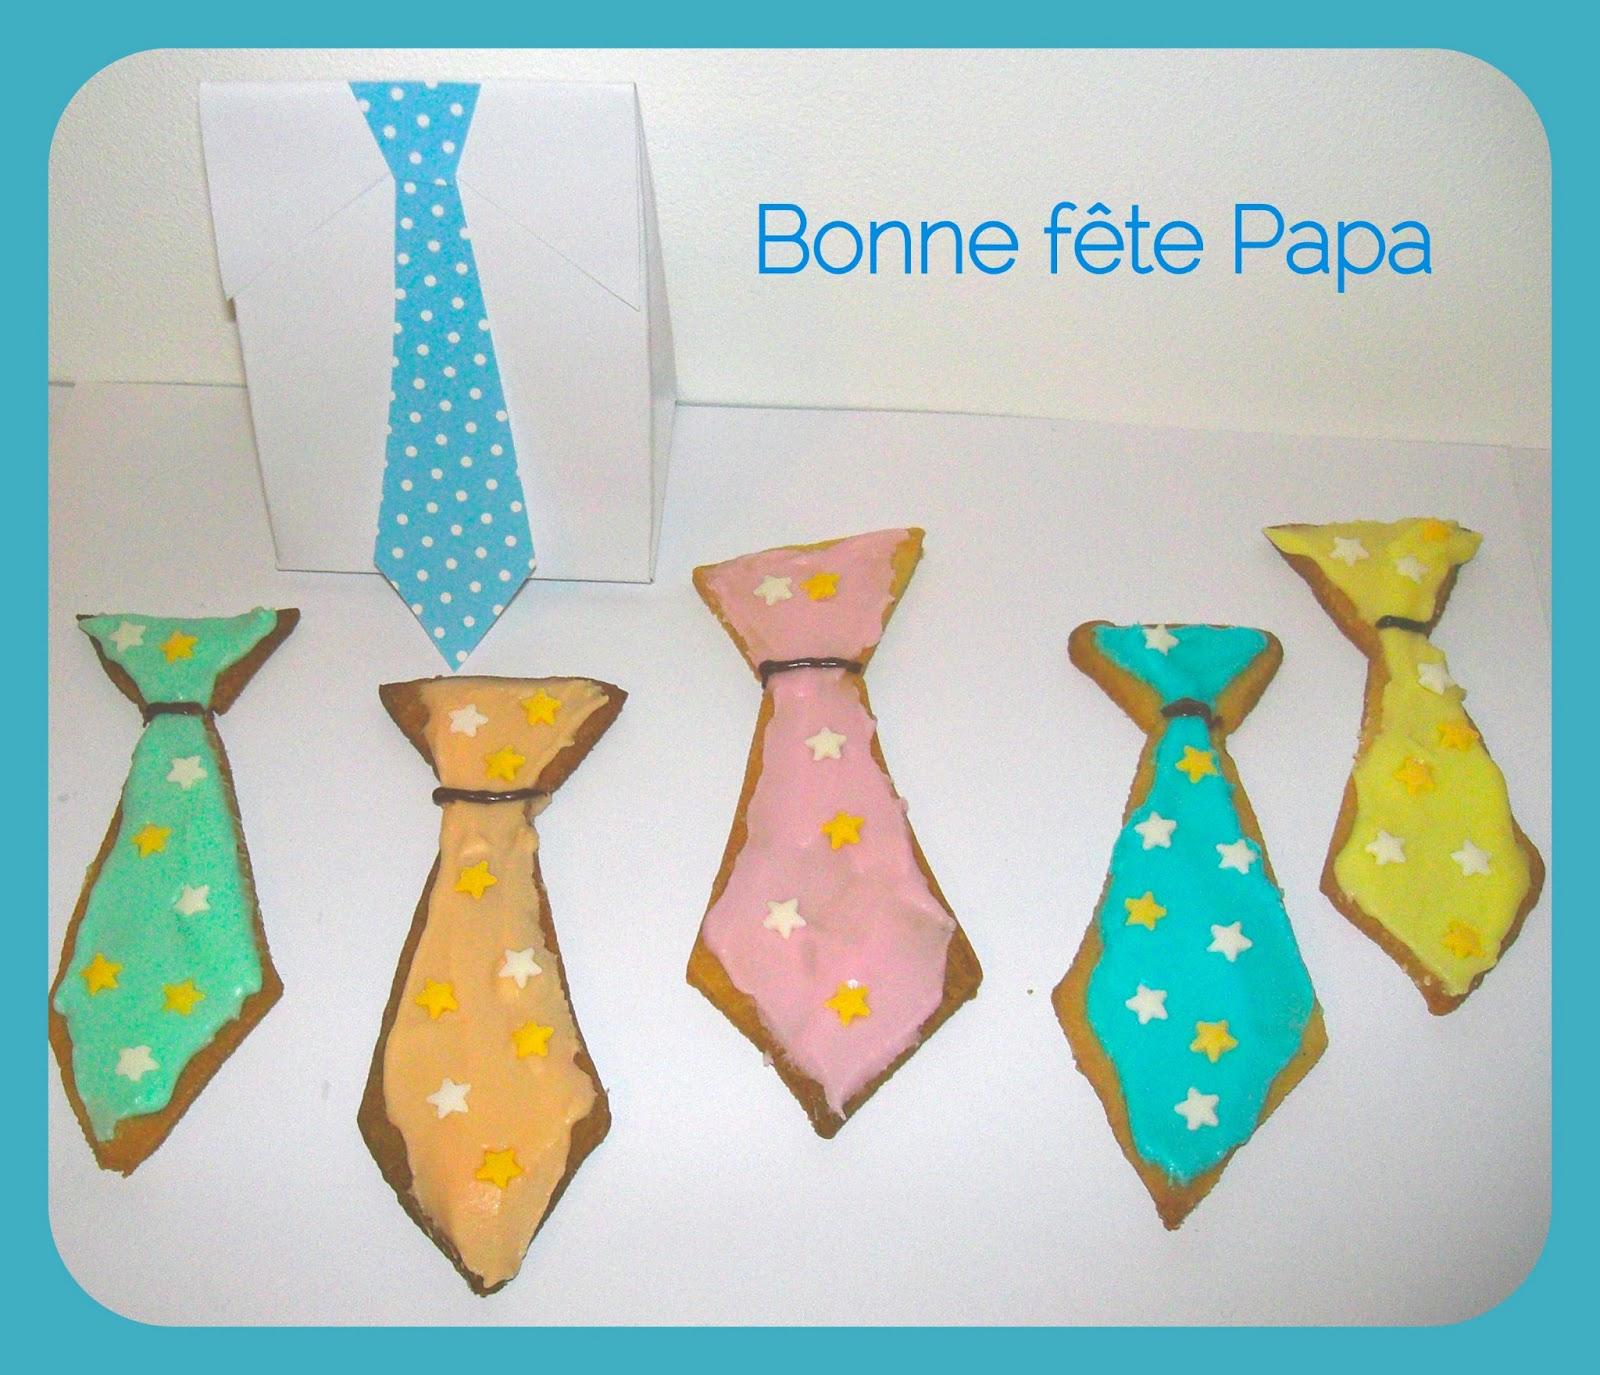 Gabulle in wonderland sabl s cravates pour la f te des p res - Idee dessin fete des peres ...